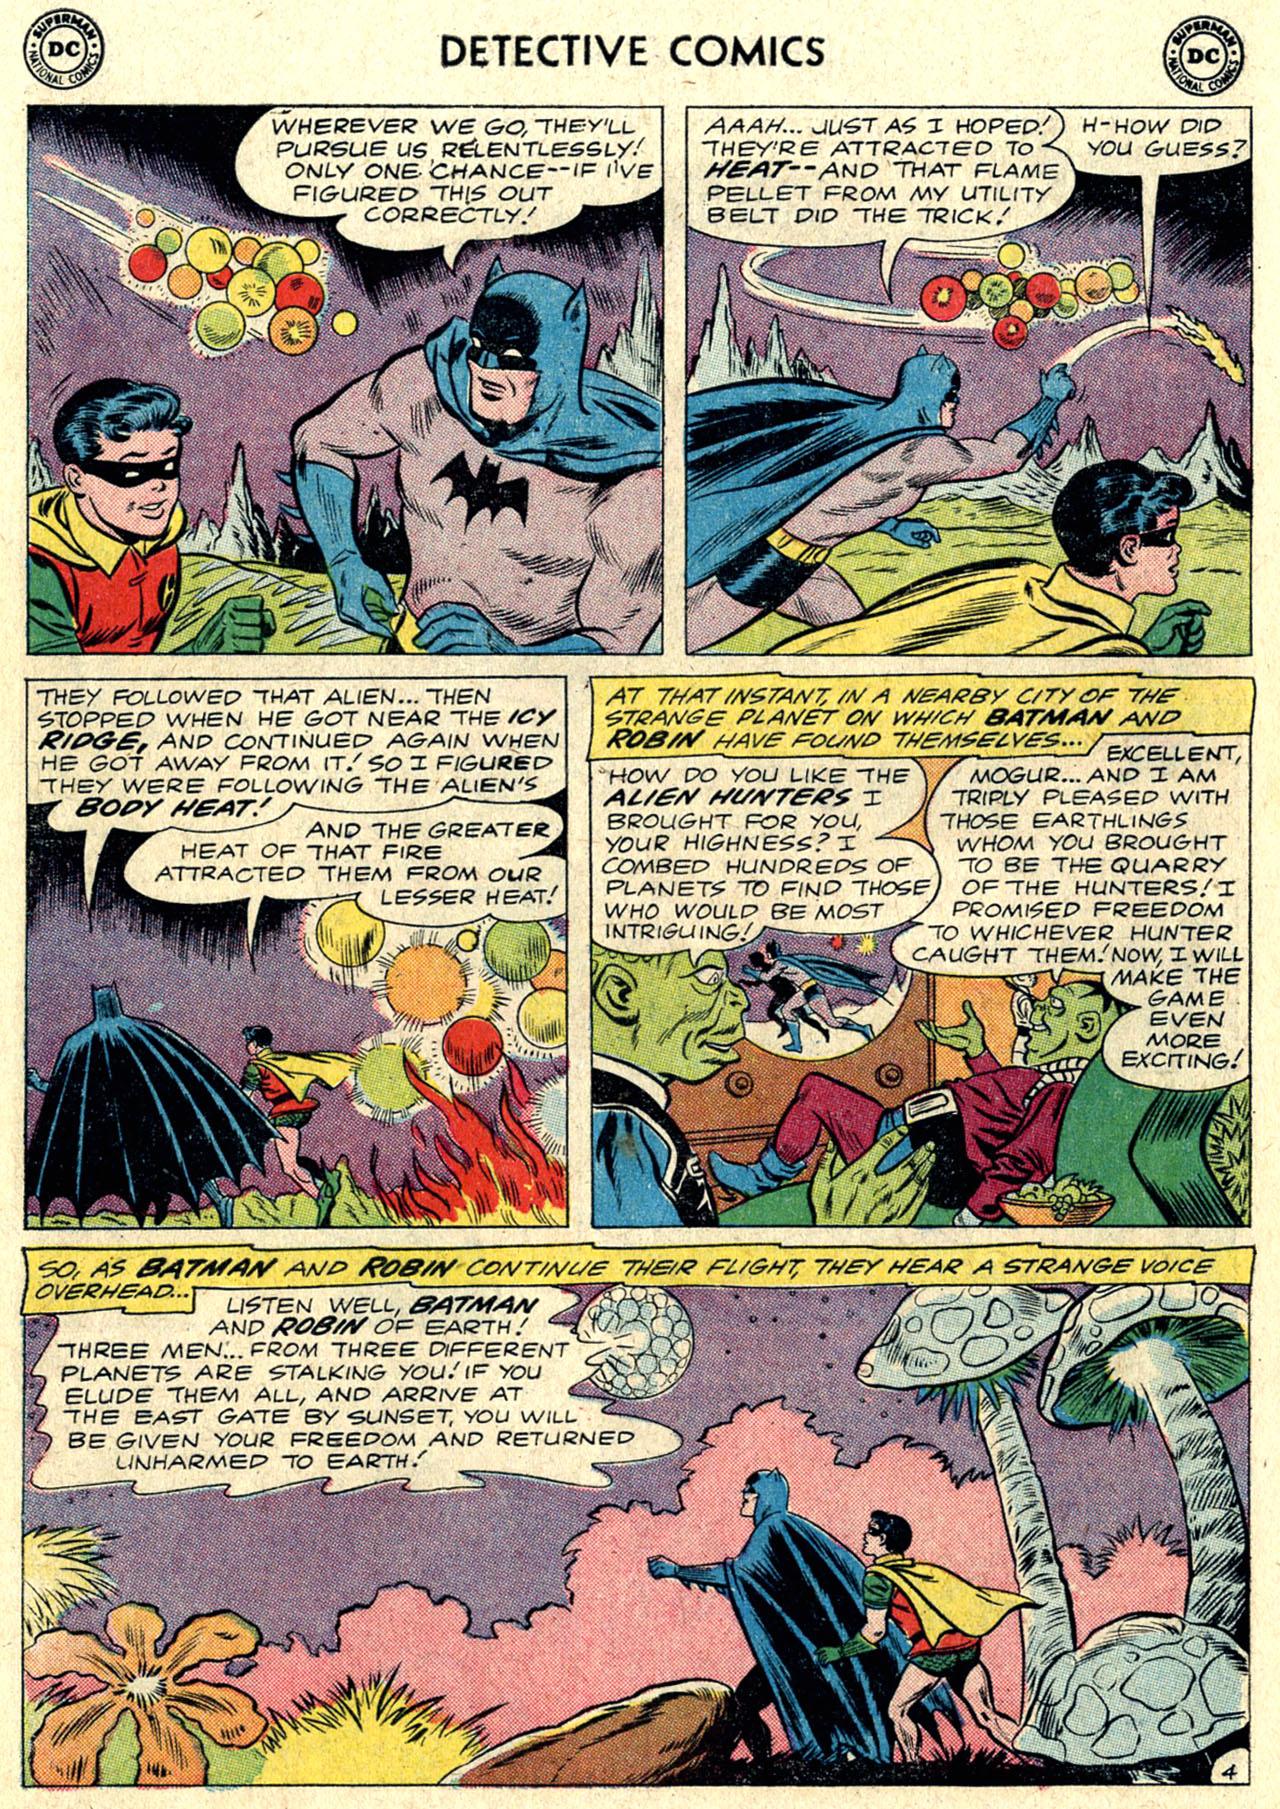 Detective Comics (1937) 299 Page 5